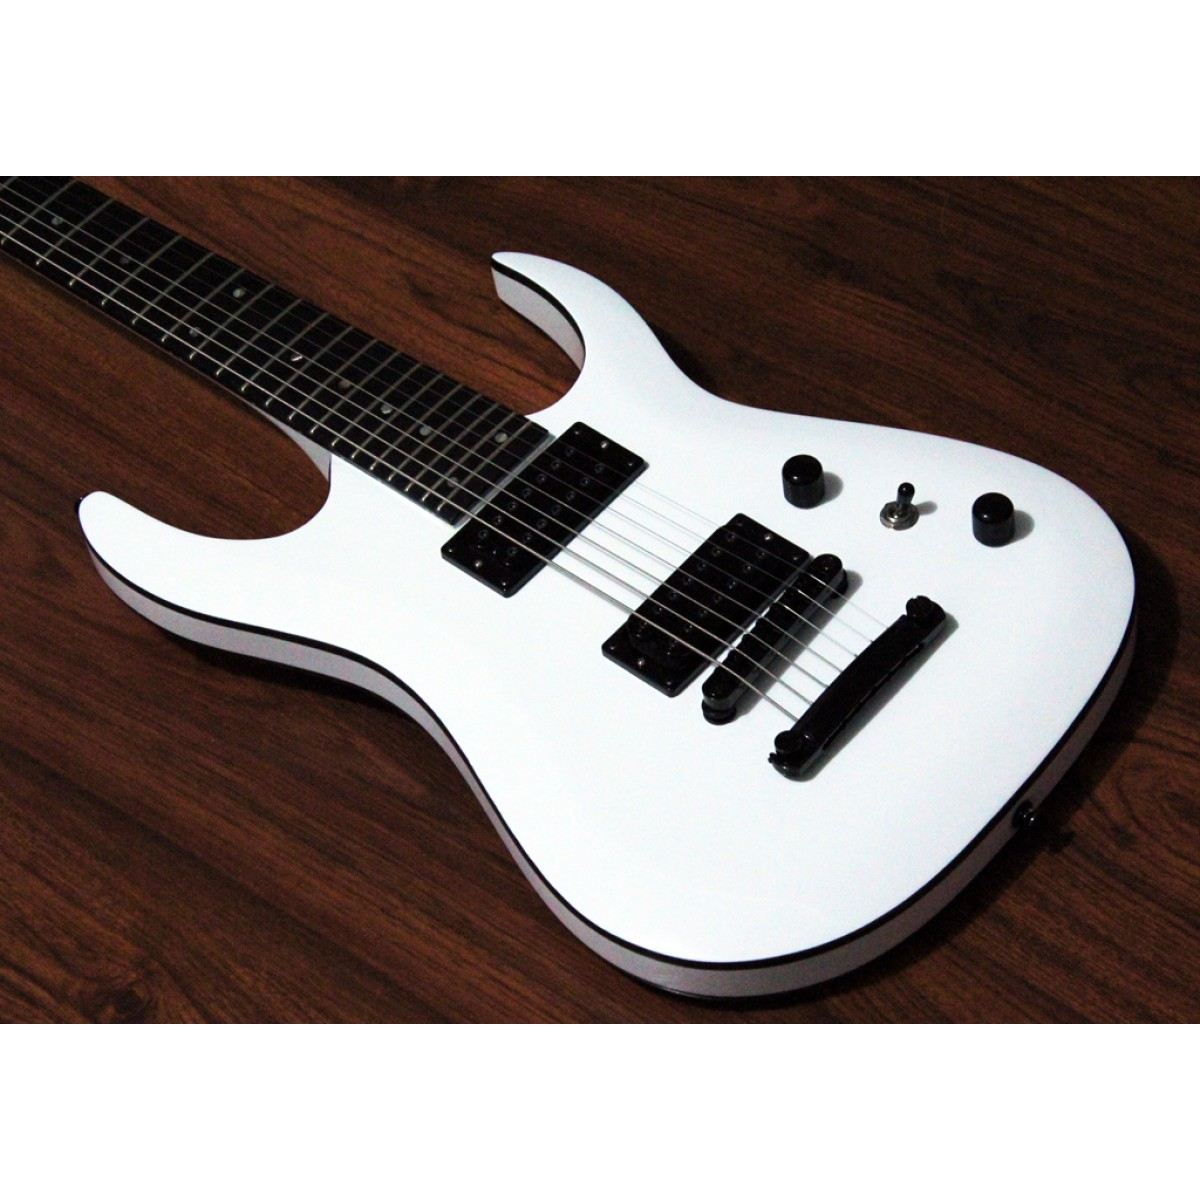 halo merus baritone 7 string tom white. Black Bedroom Furniture Sets. Home Design Ideas